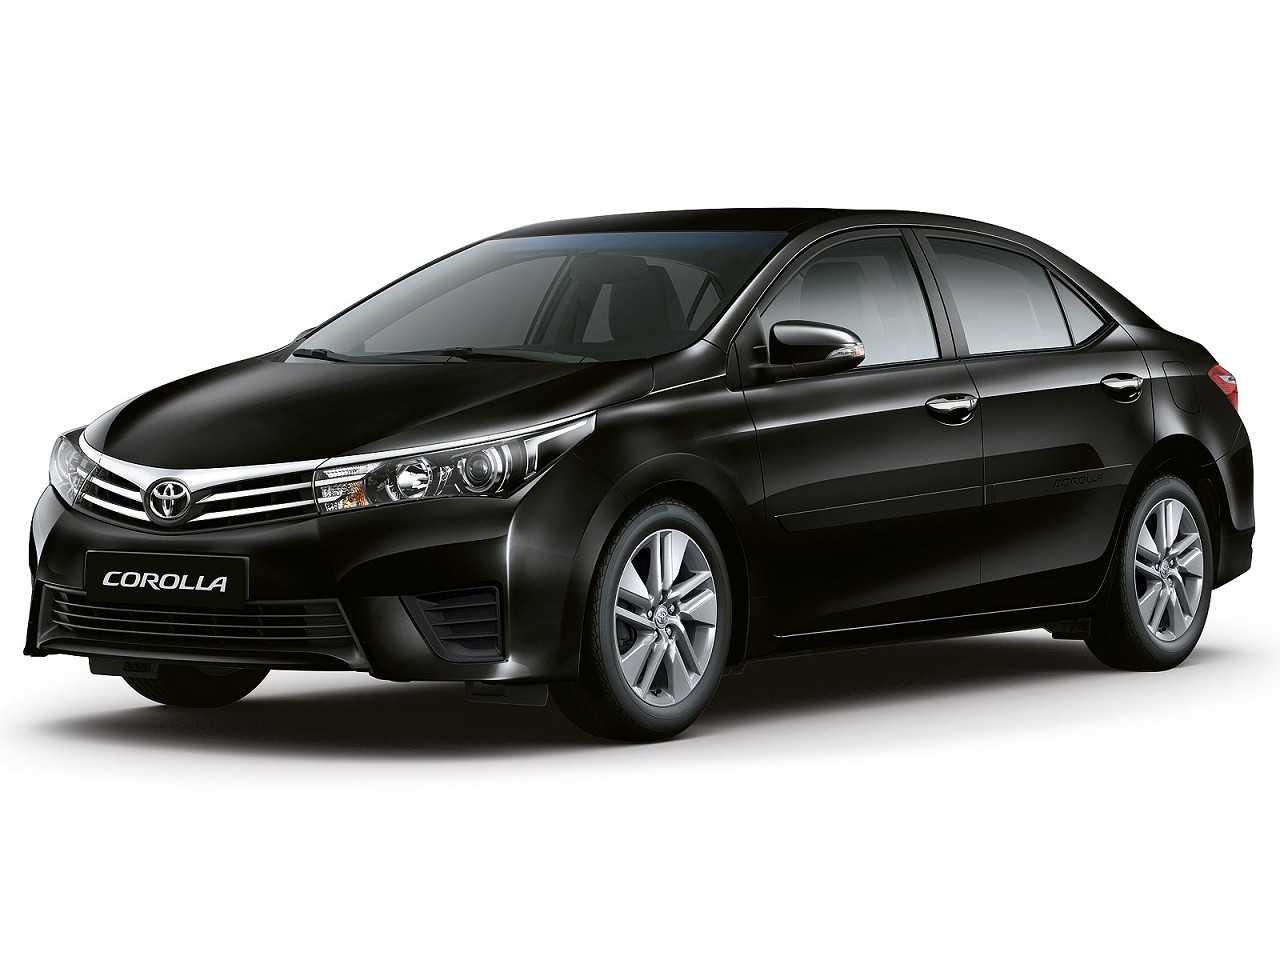 Toyota Corolla Black Pack